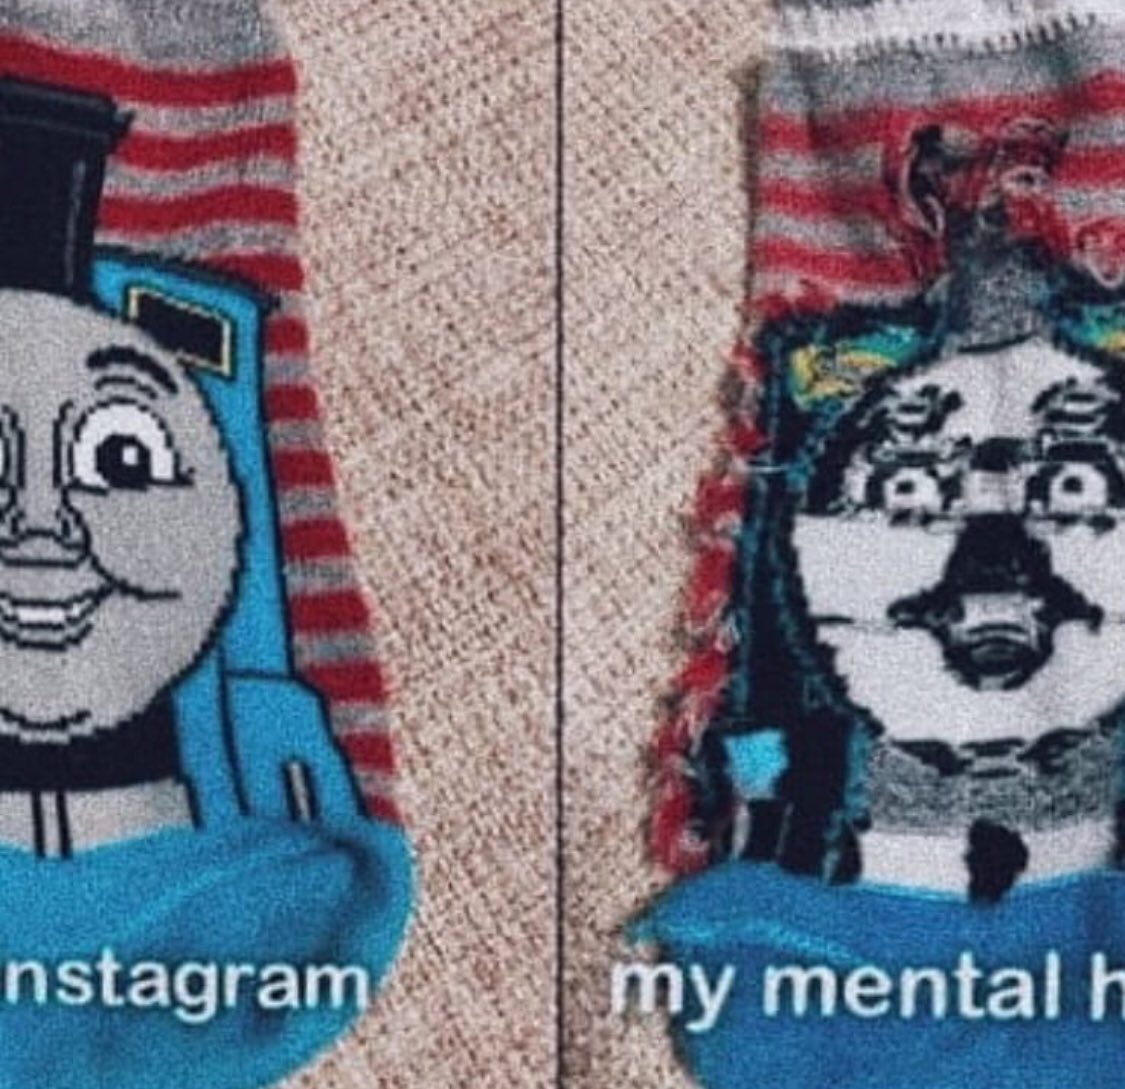 mental health posts (@edmemes5) on Twitter photo 12/07/2019 19:38:54